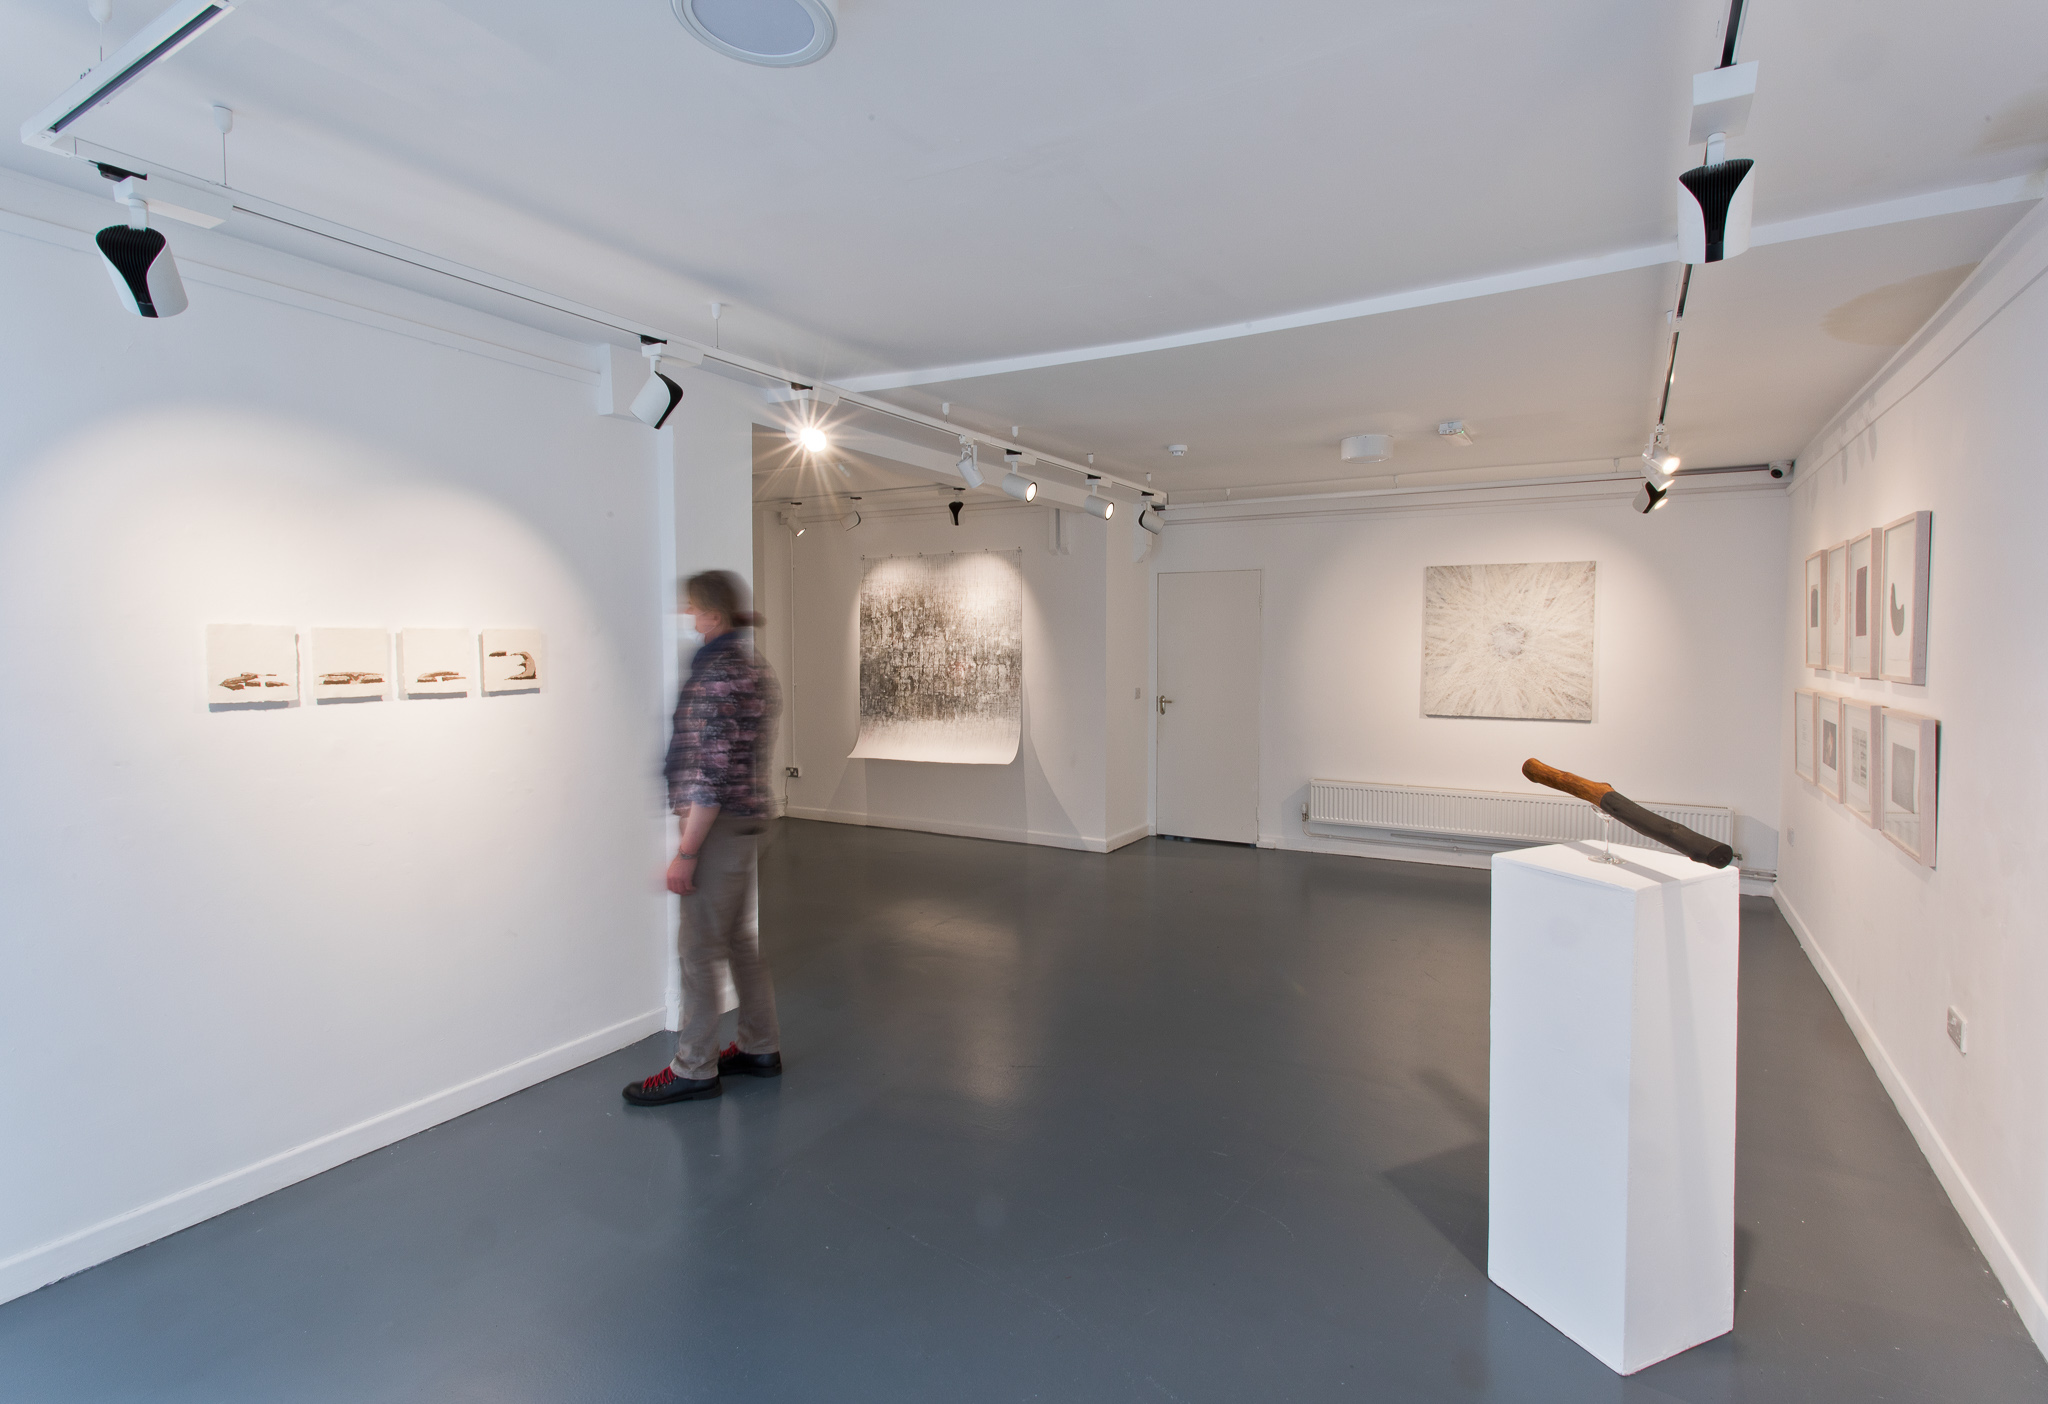 Na Cailleacha - Installation view